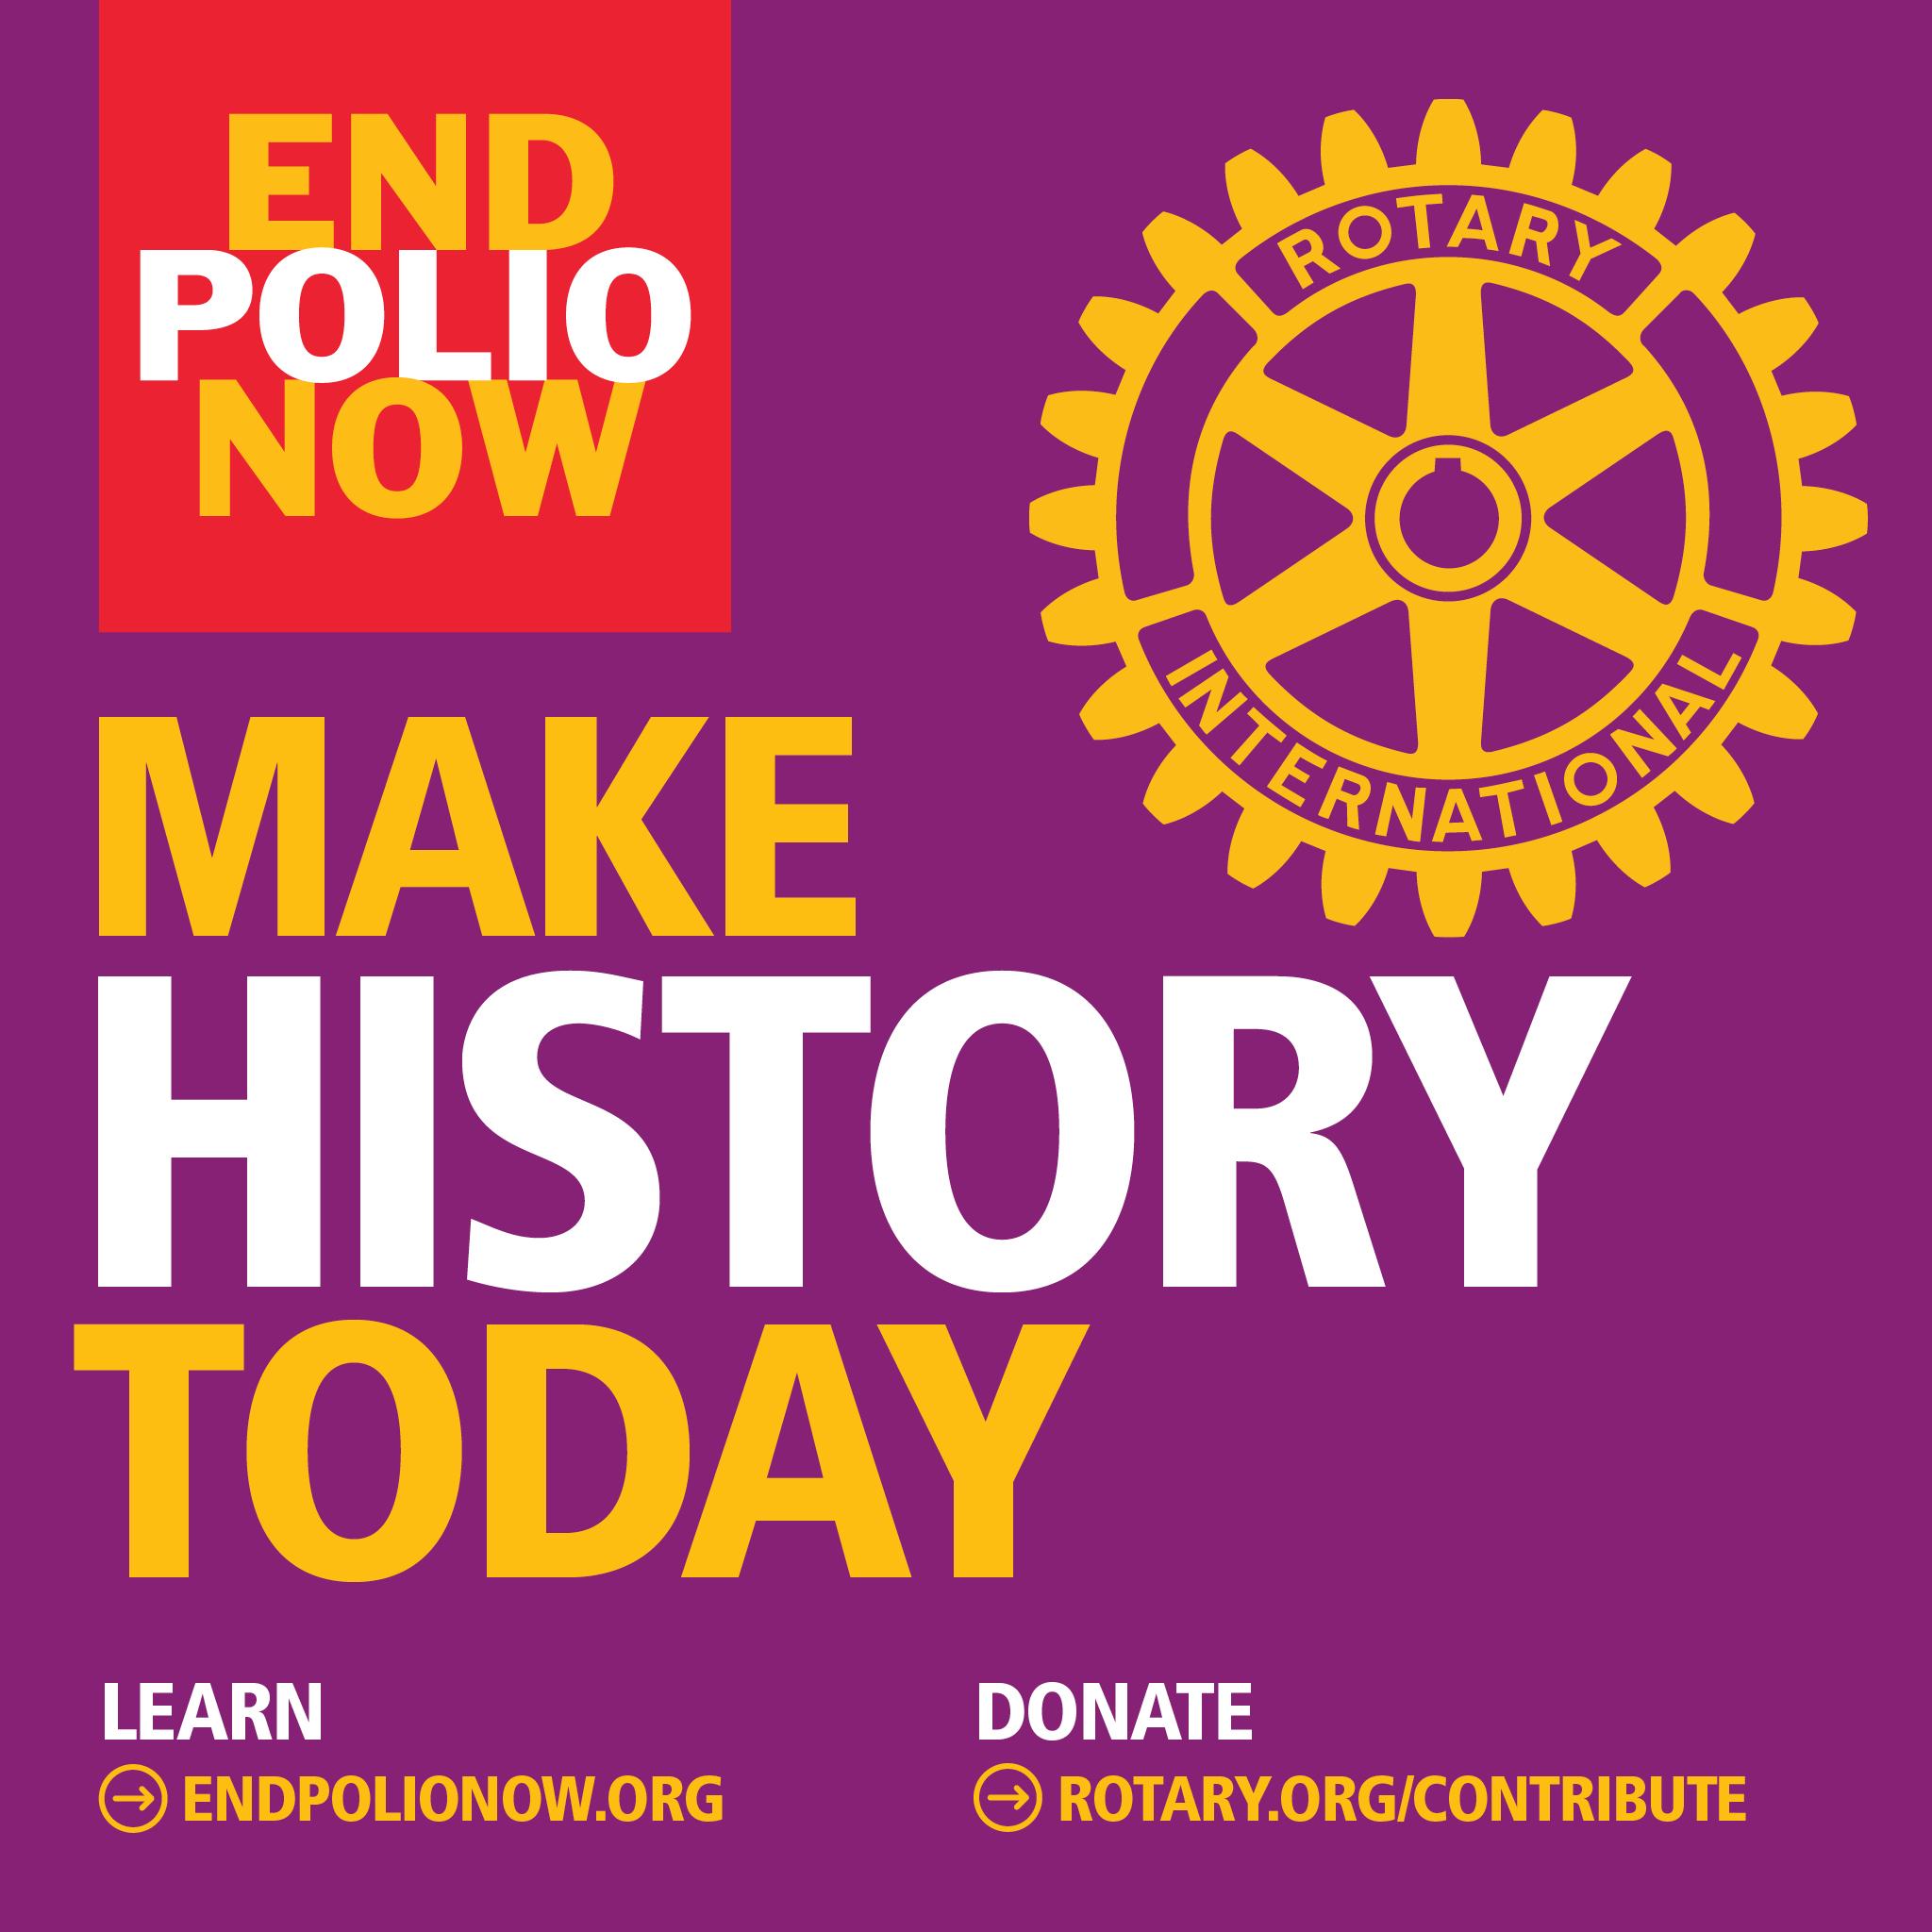 make history end polio